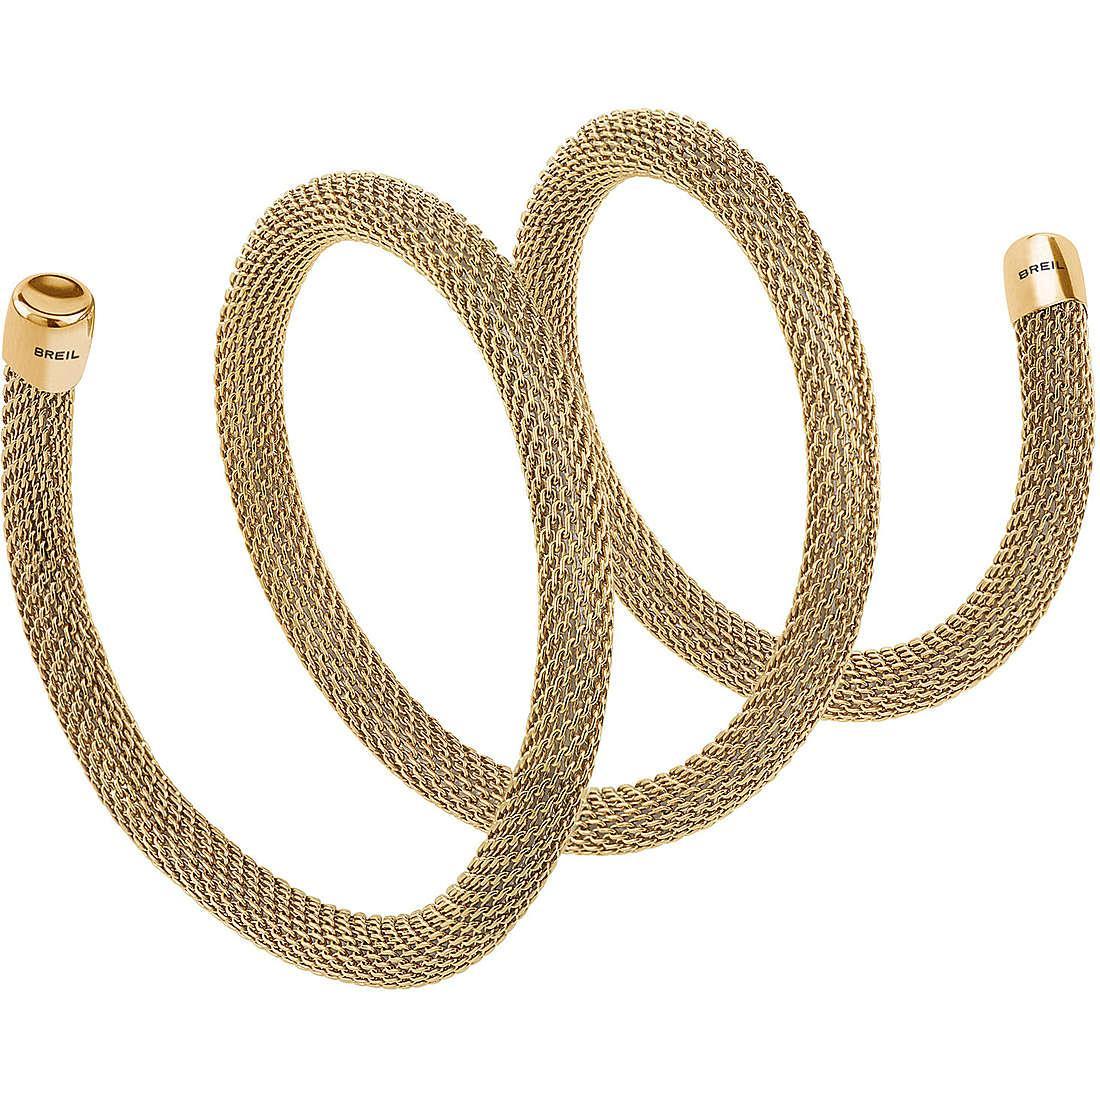 Collana donna gioielli breil new snake tj2712